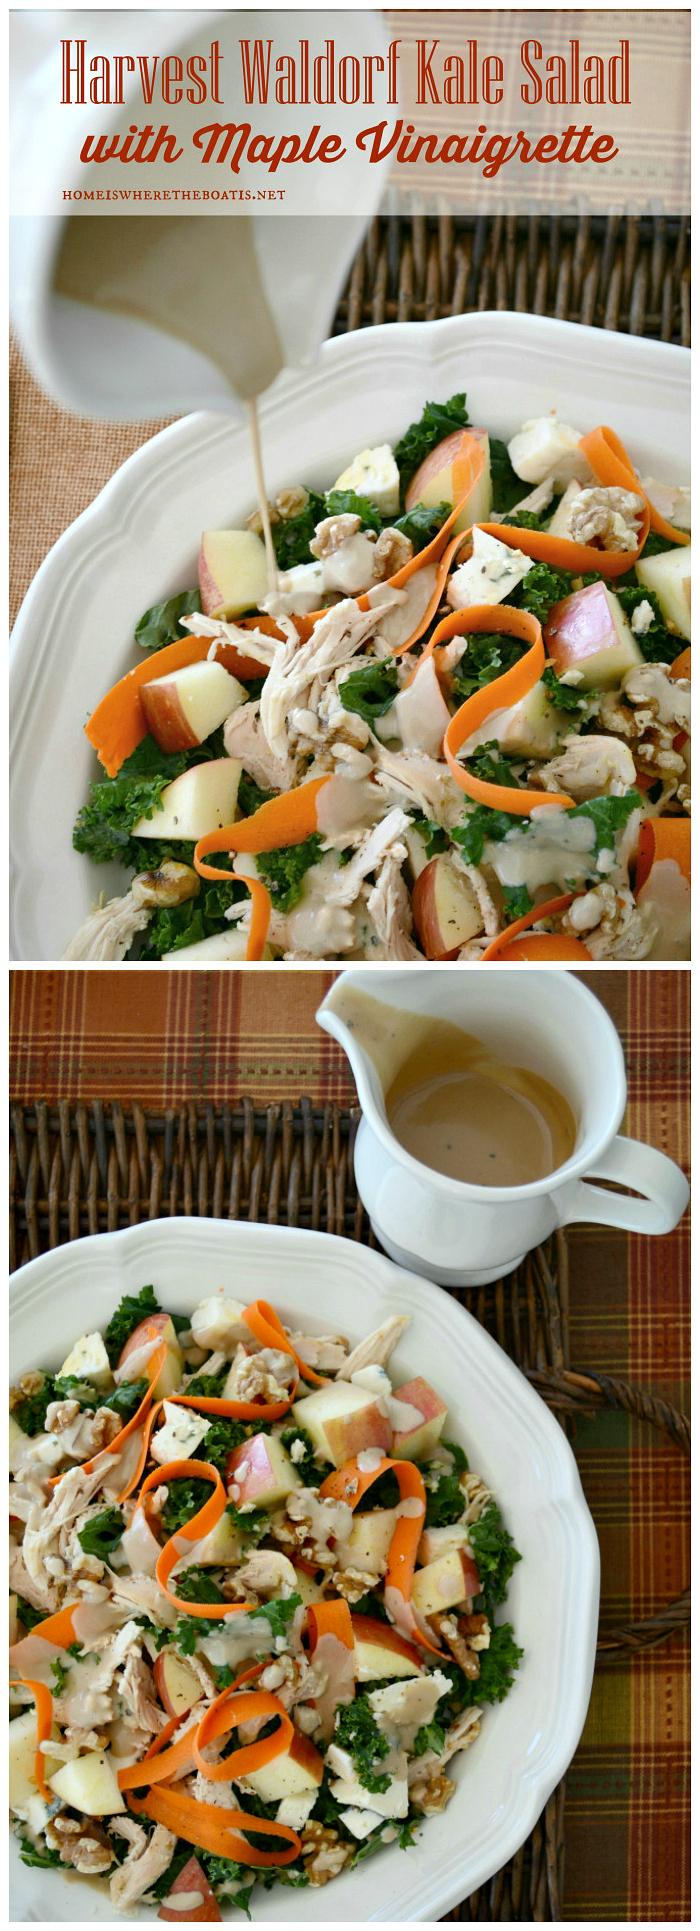 Harvest Waldorf Kale Salad with MapleVinaigrette | ©homeiswheretheboatis.net #fall #salad #kale #apple